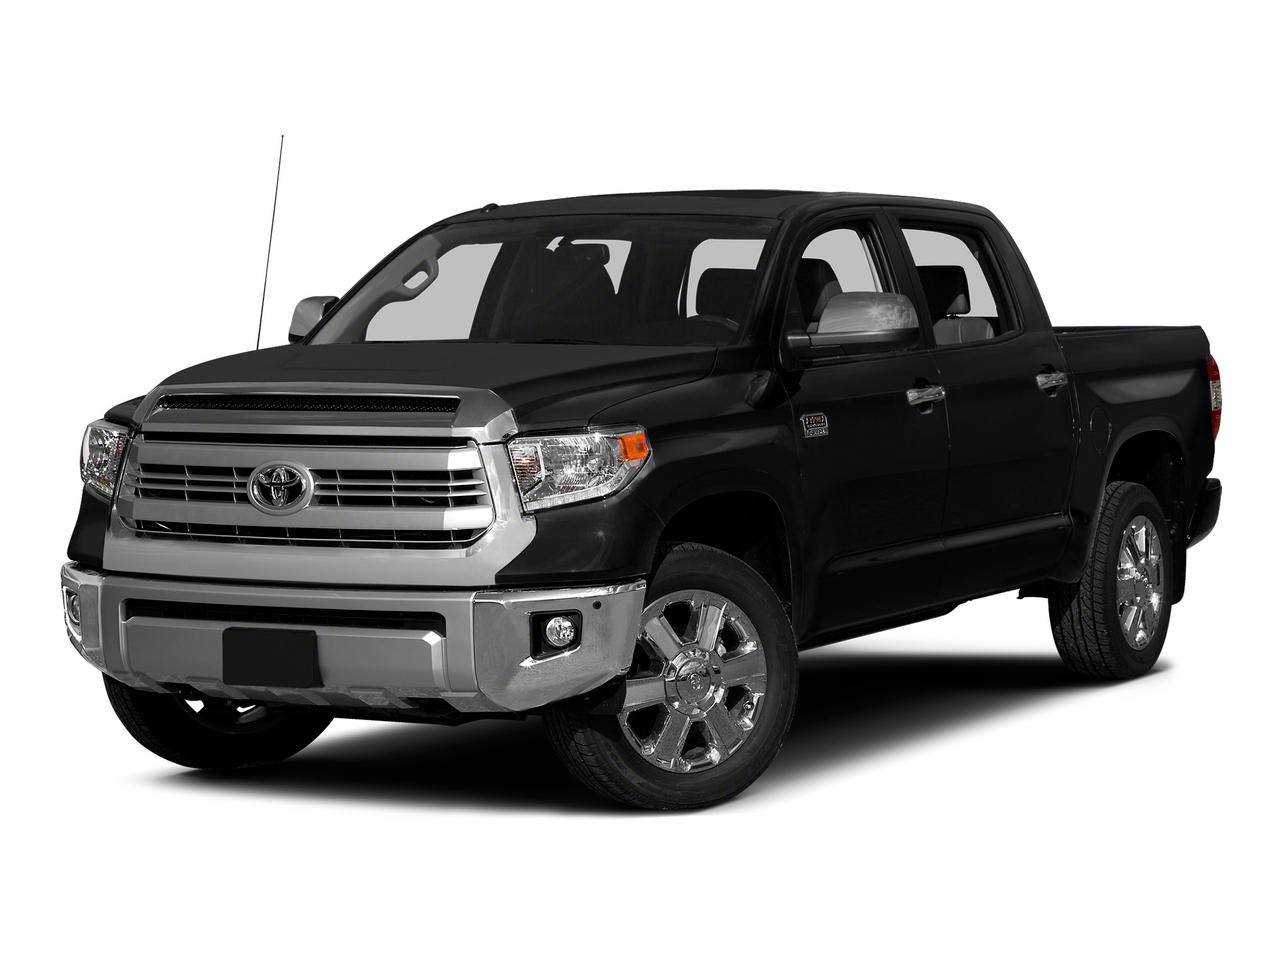 2015 Toyota Tundra 4WD Truck Vehicle Photo in Houston, TX 77090